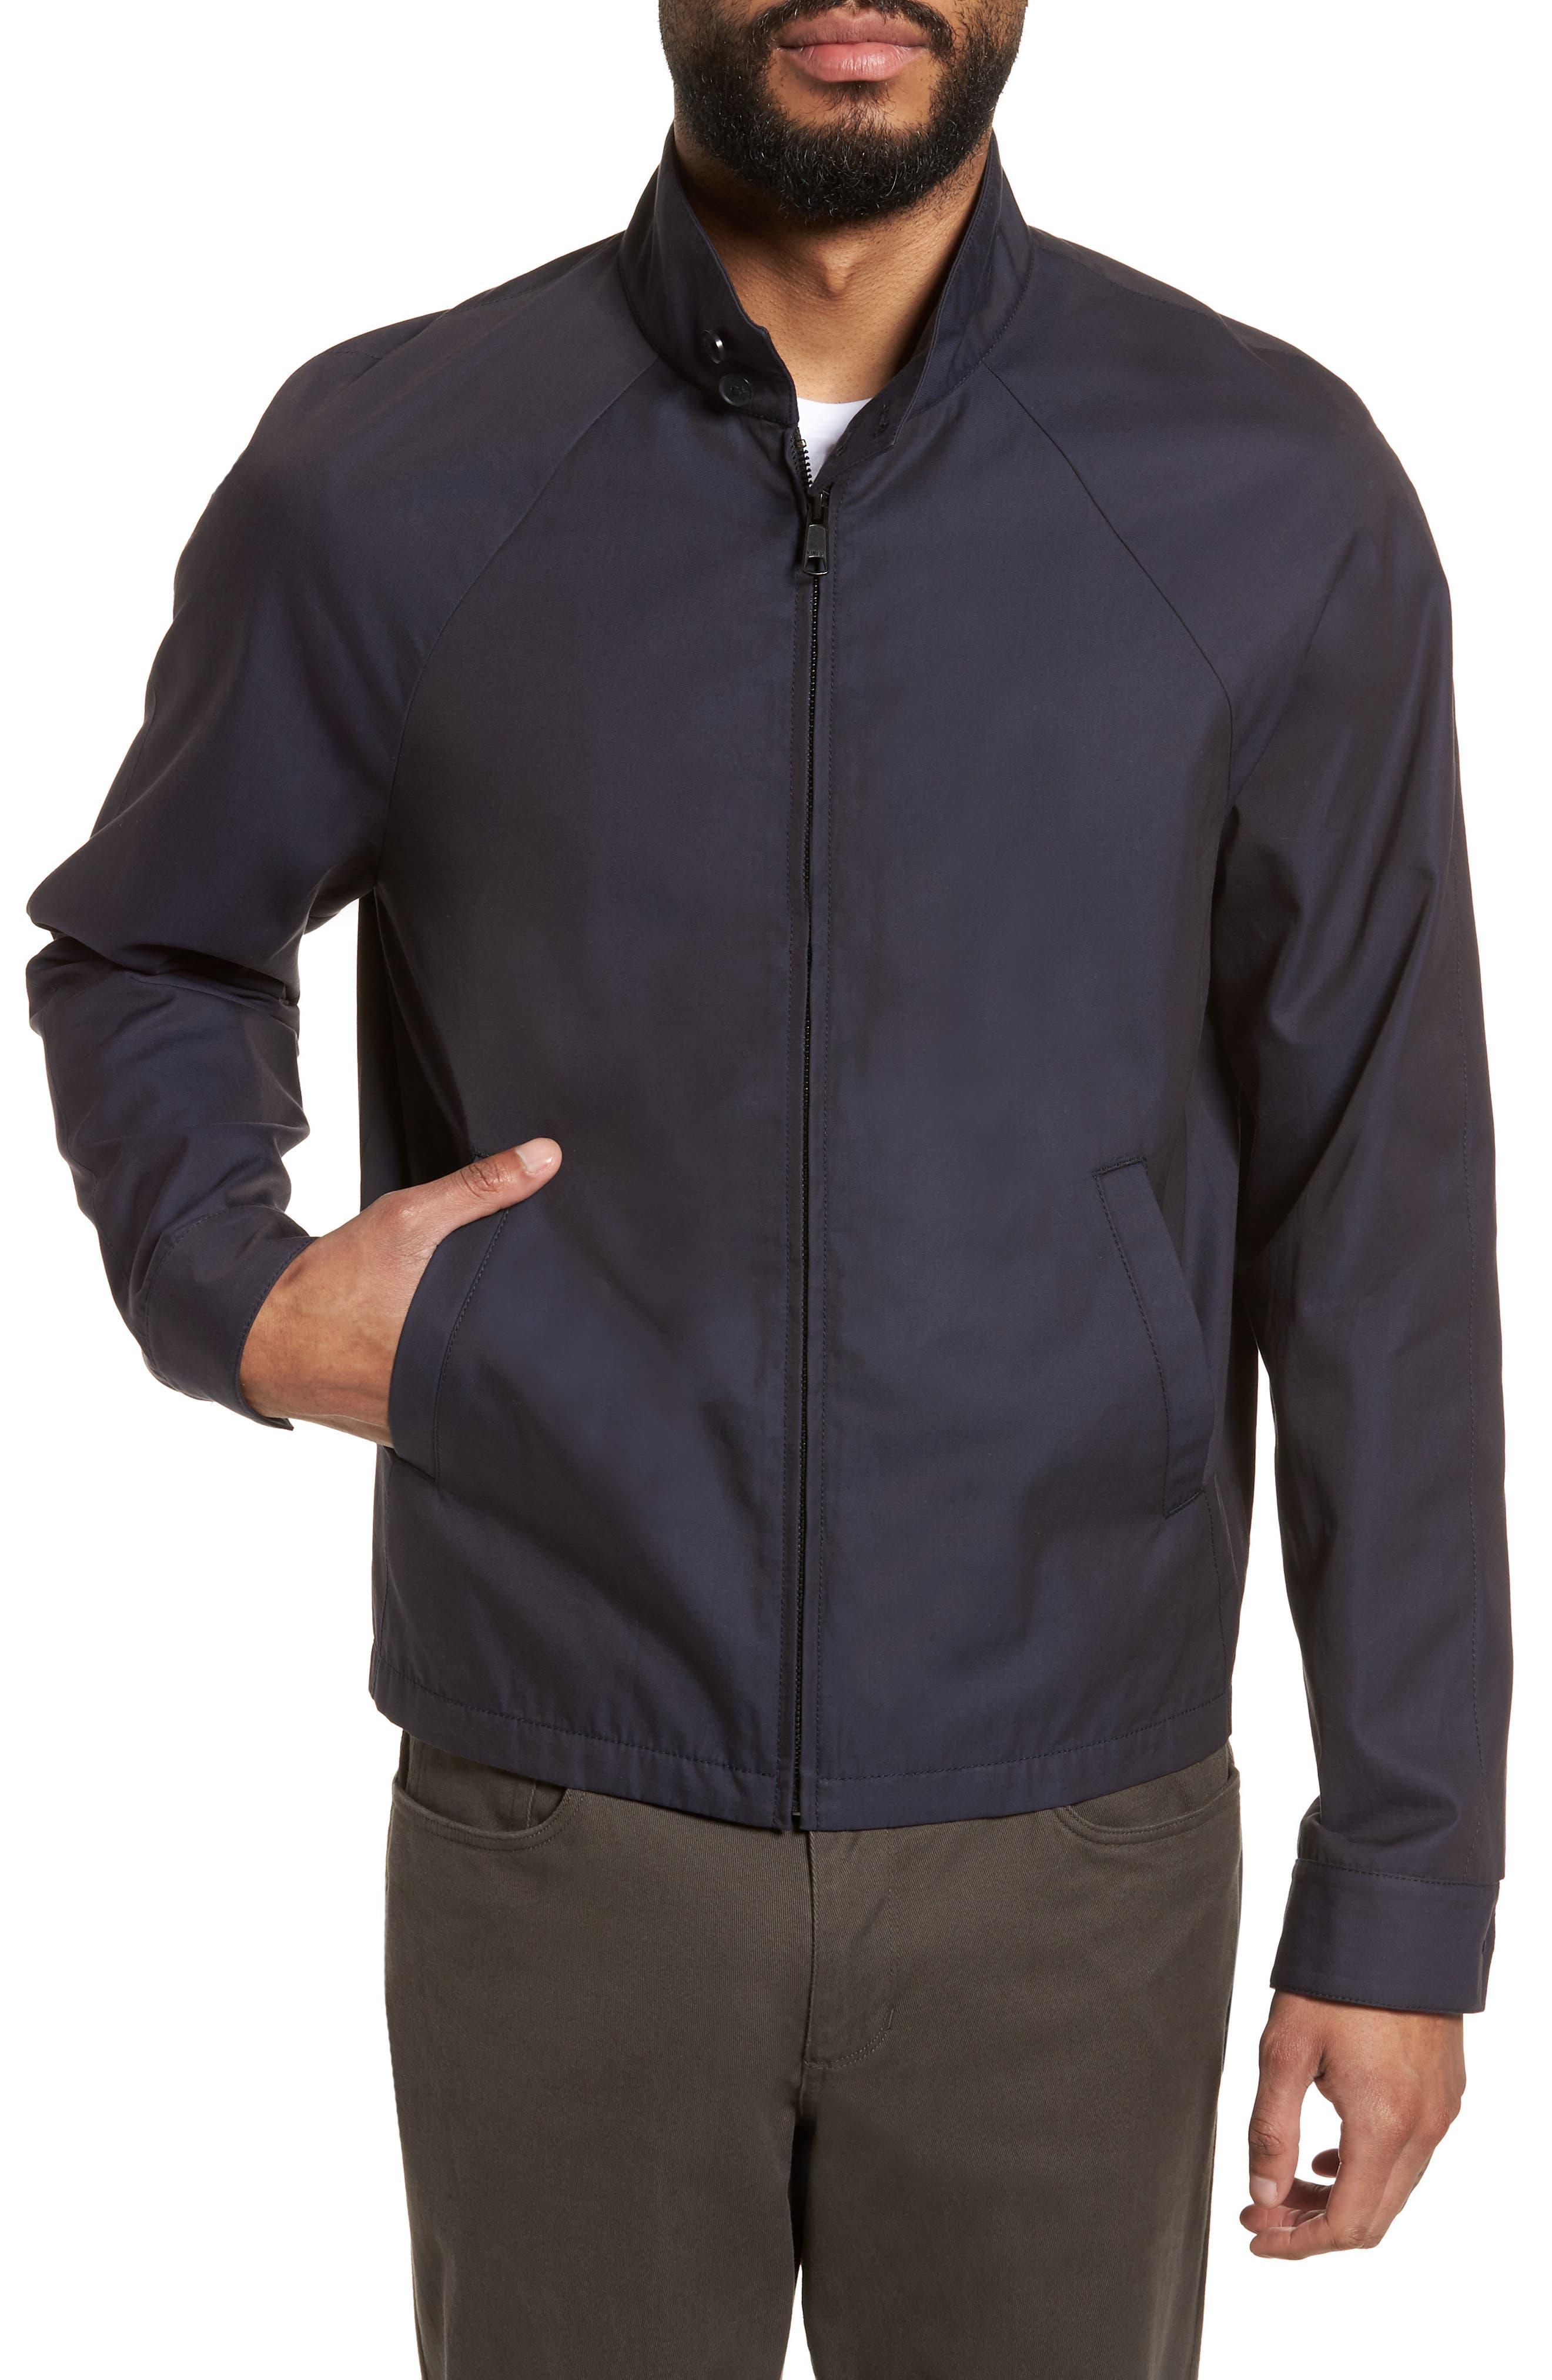 Regular Fit Jacket,                             Alternate thumbnail 4, color,                             NAVY